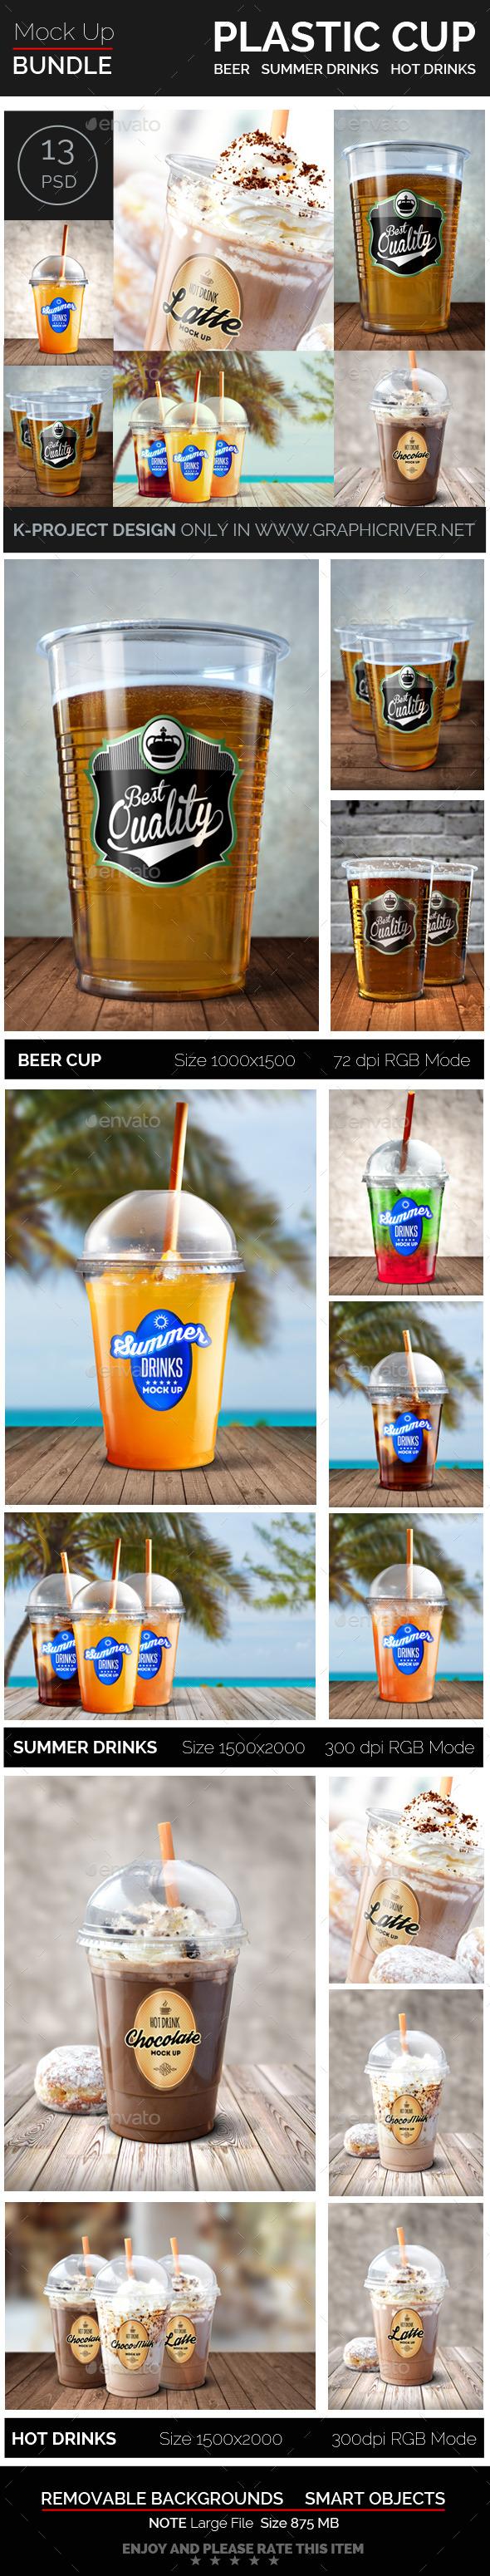 Plastic Cup Mock Up Bundle - Food and Drink Packaging